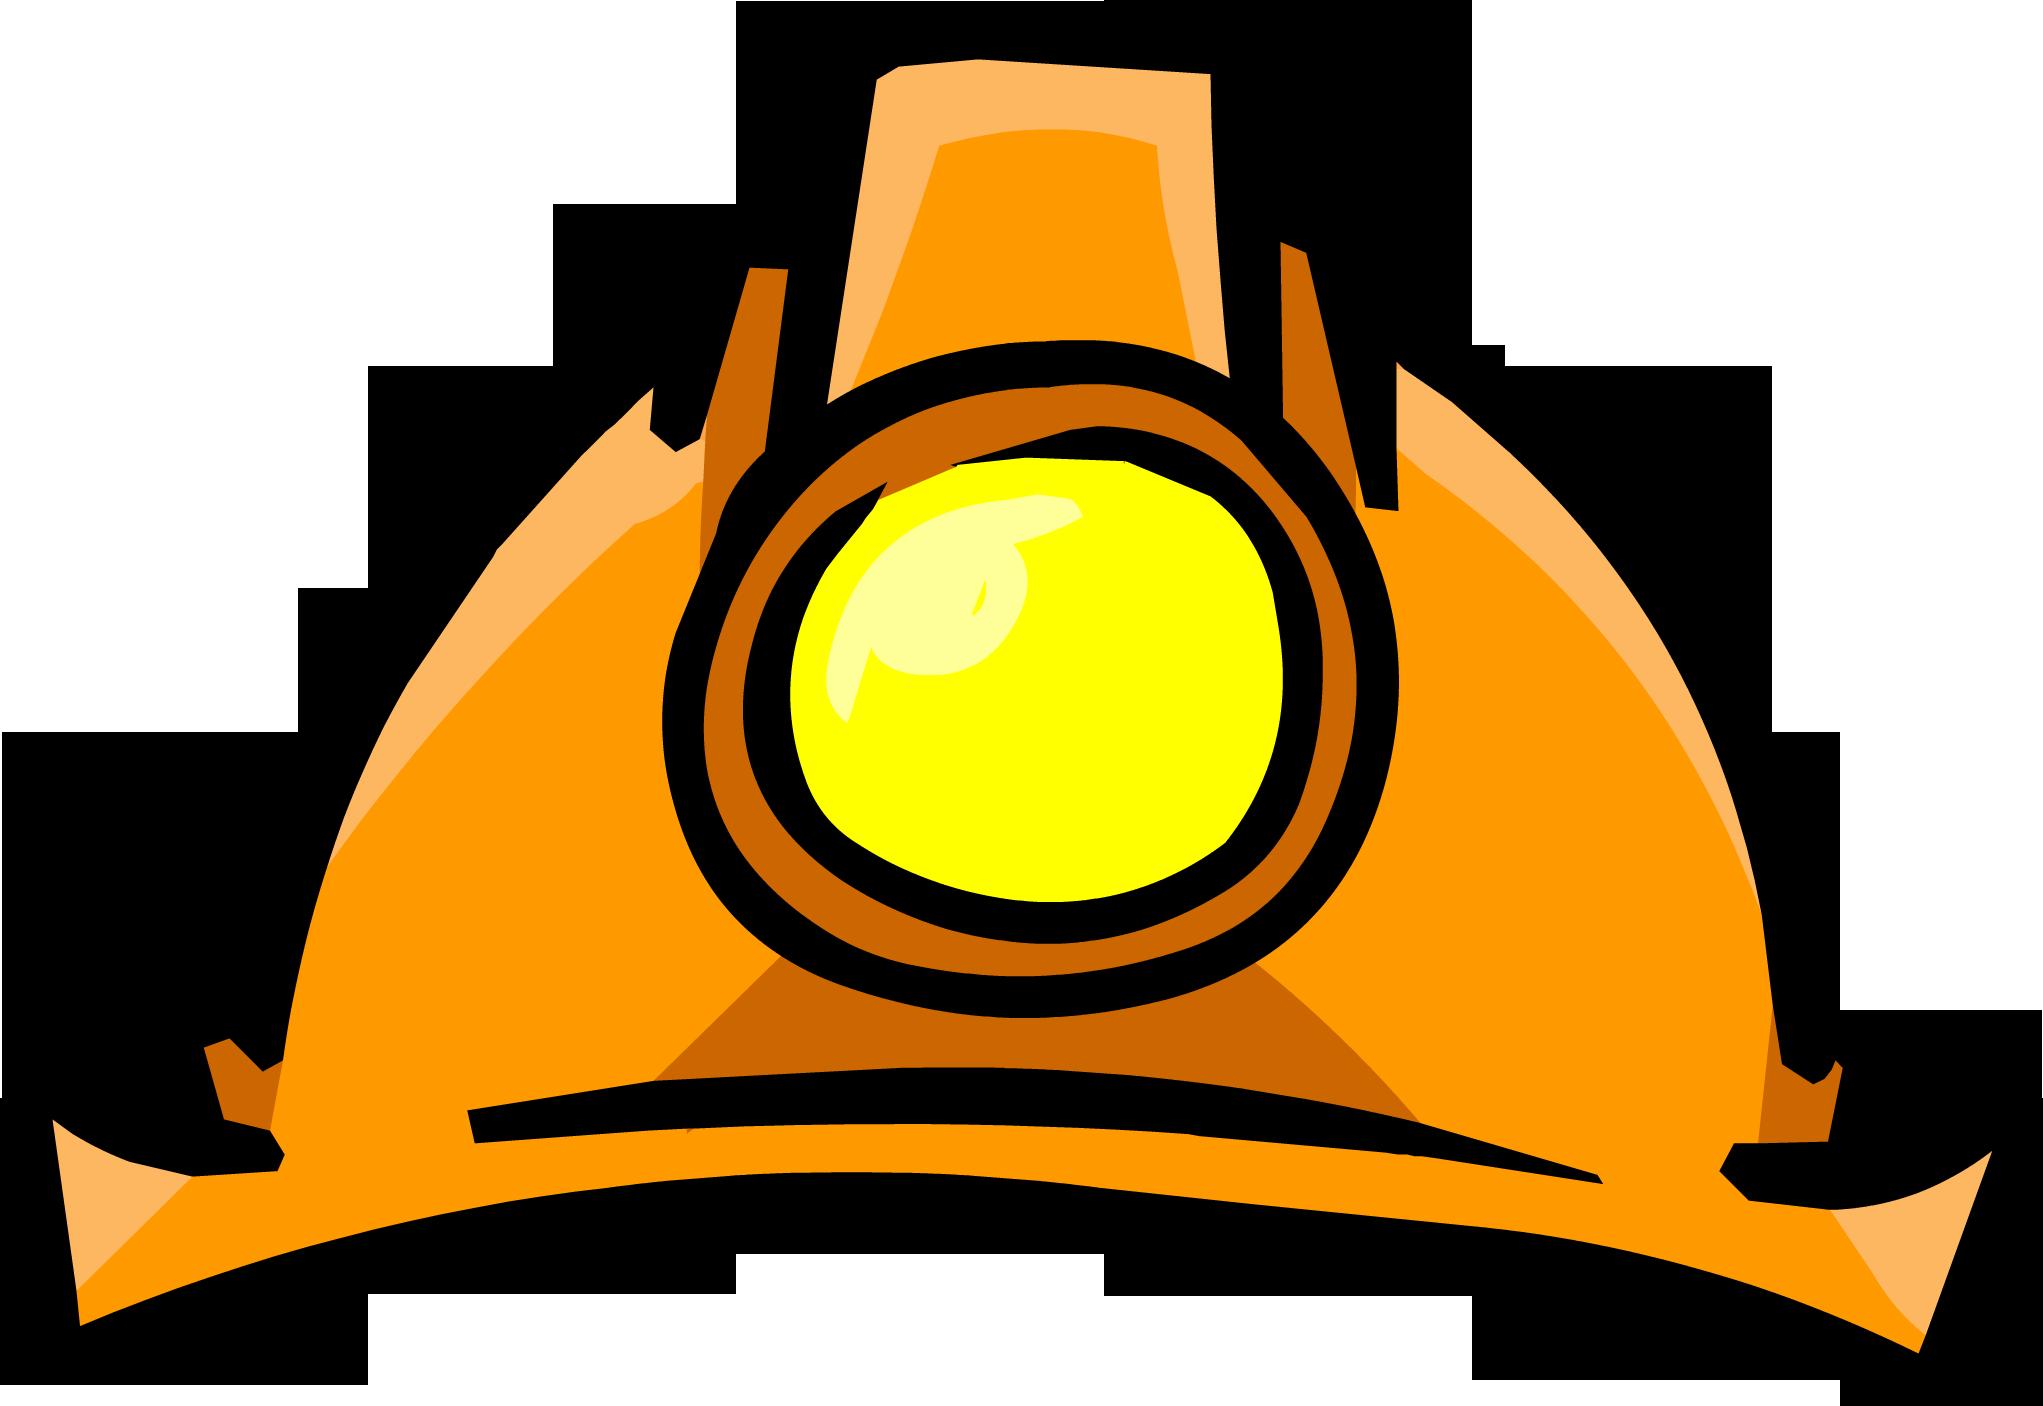 Miners helmet club penguin. Clipart hammer mining